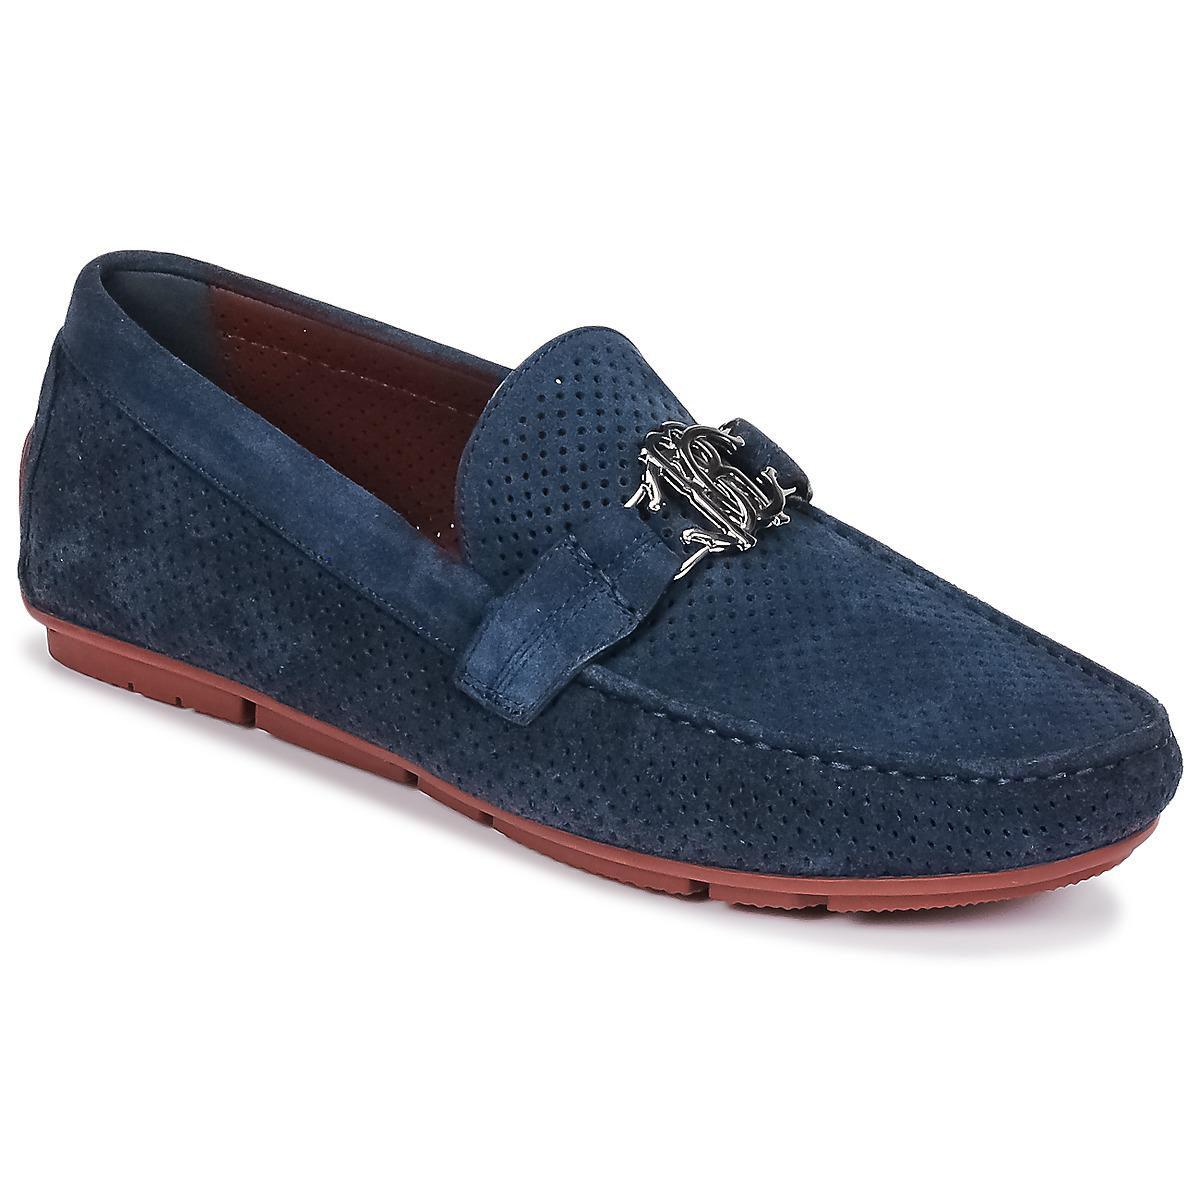 0467441a1da Roberto Cavalli 4217 Men s Loafers   Casual Shoes In Blue in Blue ...